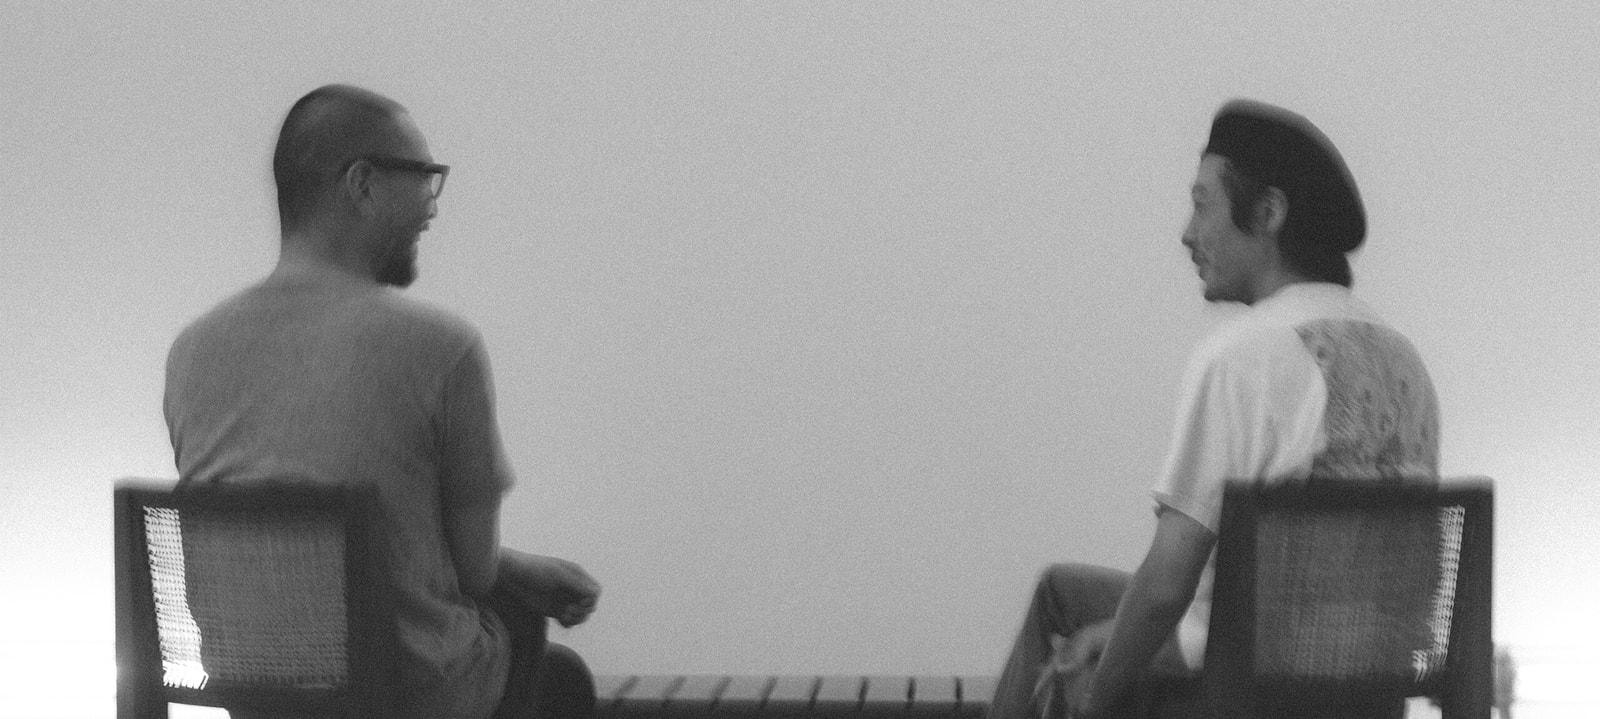 THE NORTH FACE × HYKE の節目に吉原秀明と写真家・水谷太郎が想うこと